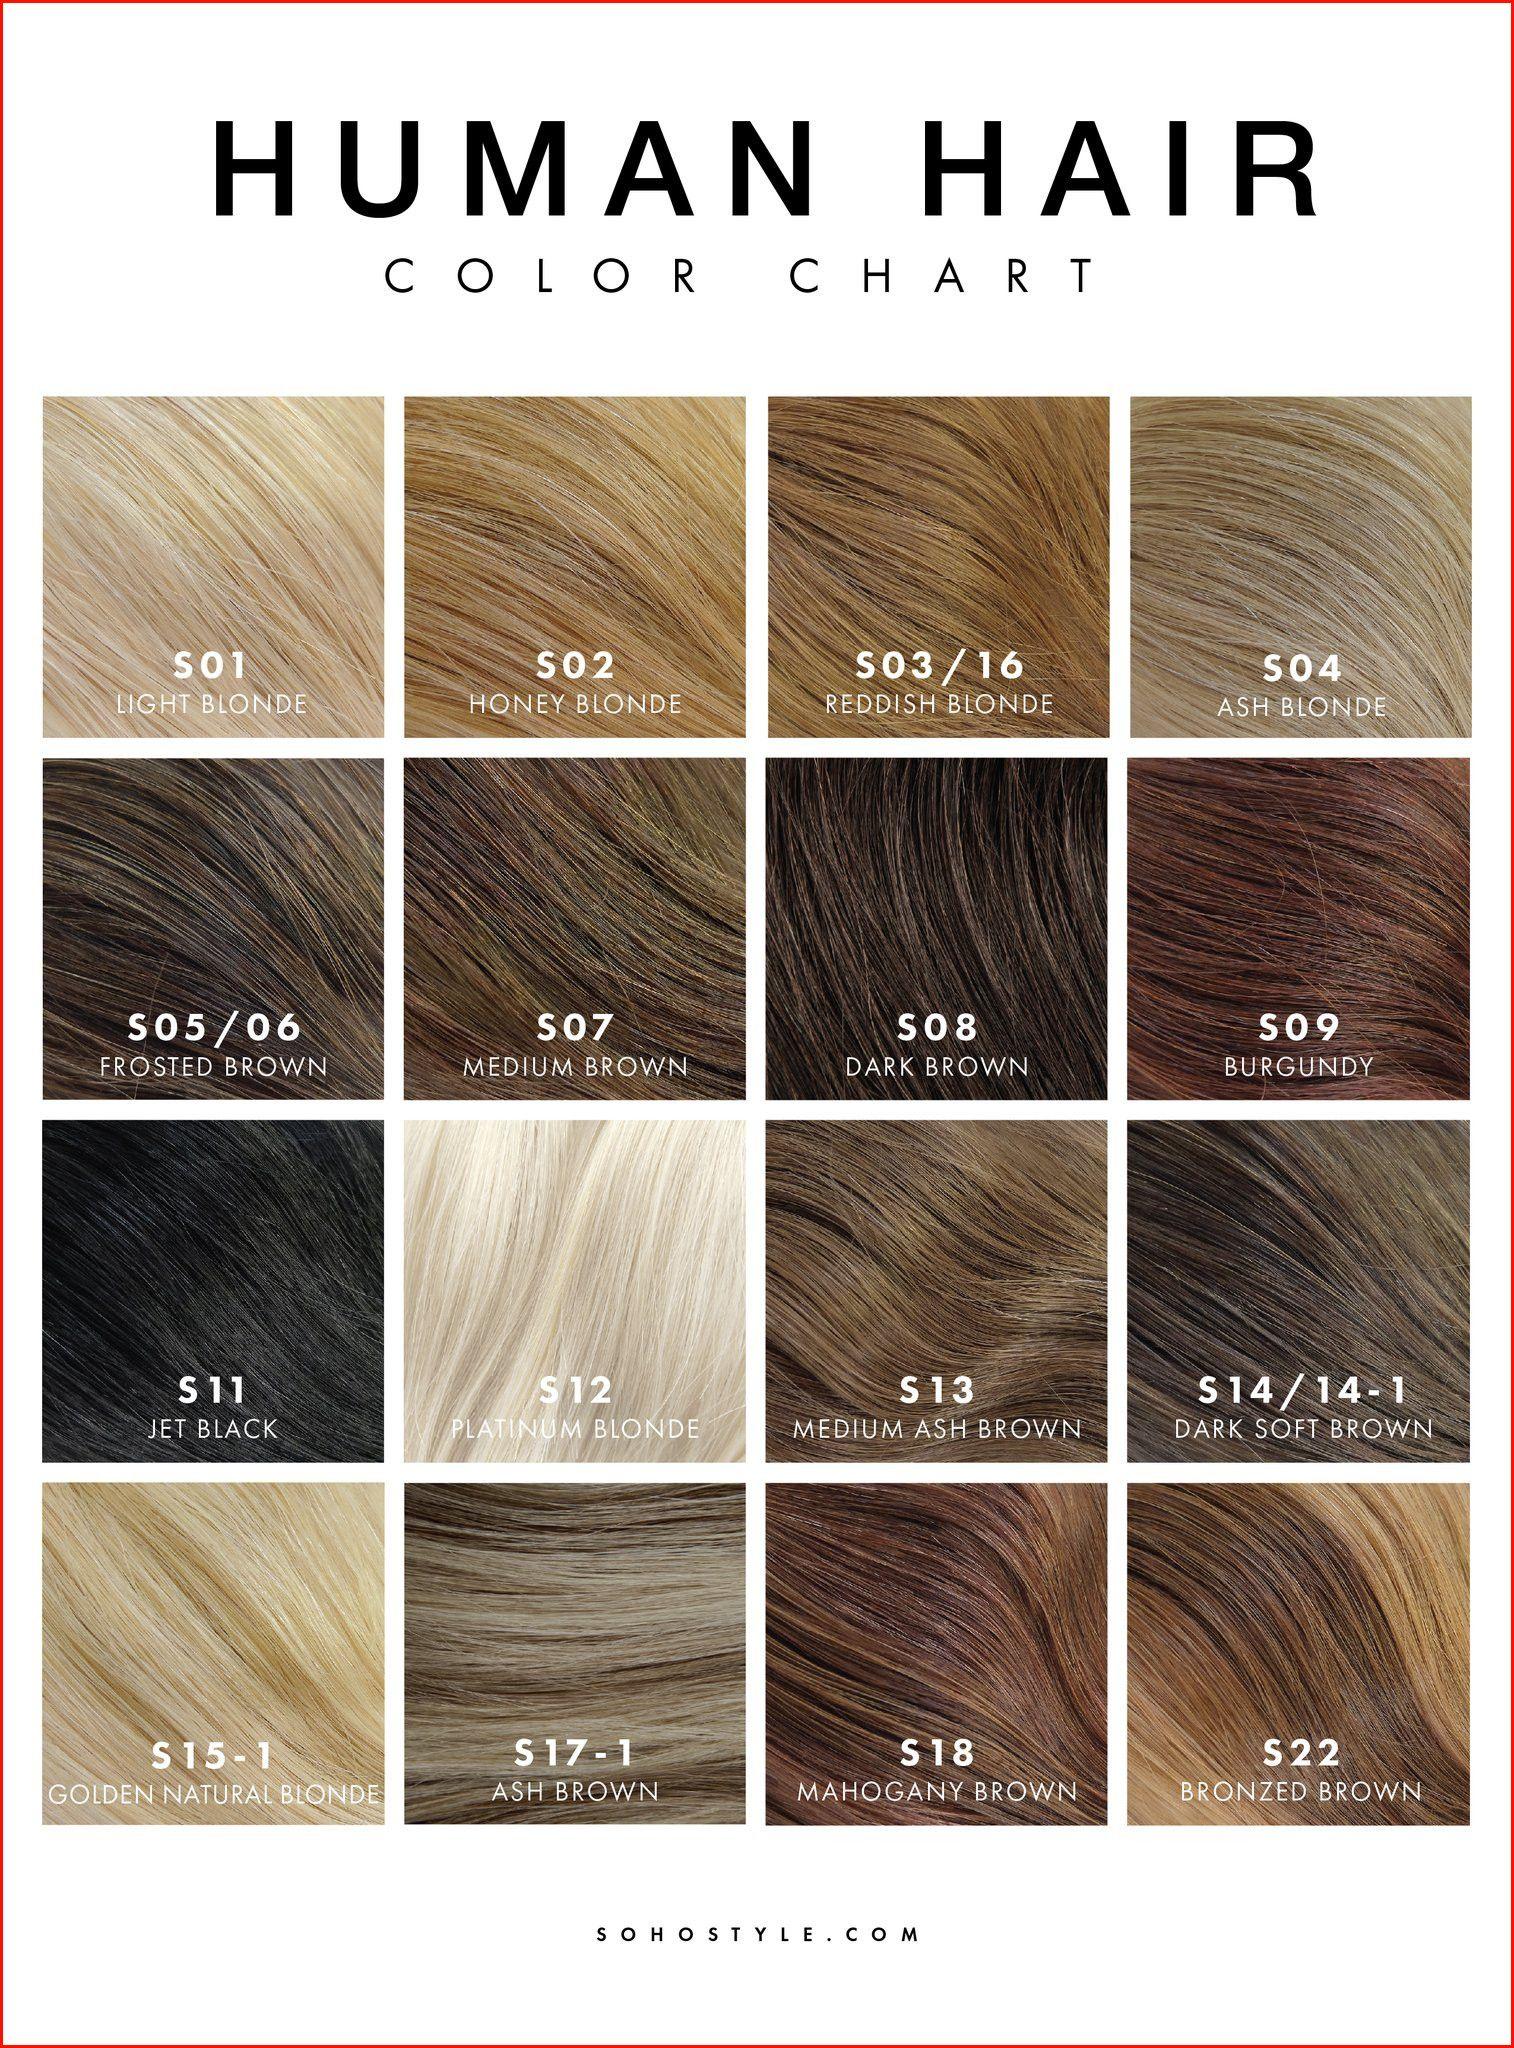 Inoa Hair Colour Chart India In 2020 Hair Color Chart Hair Dye Color Chart Loreal Hair Color Chart